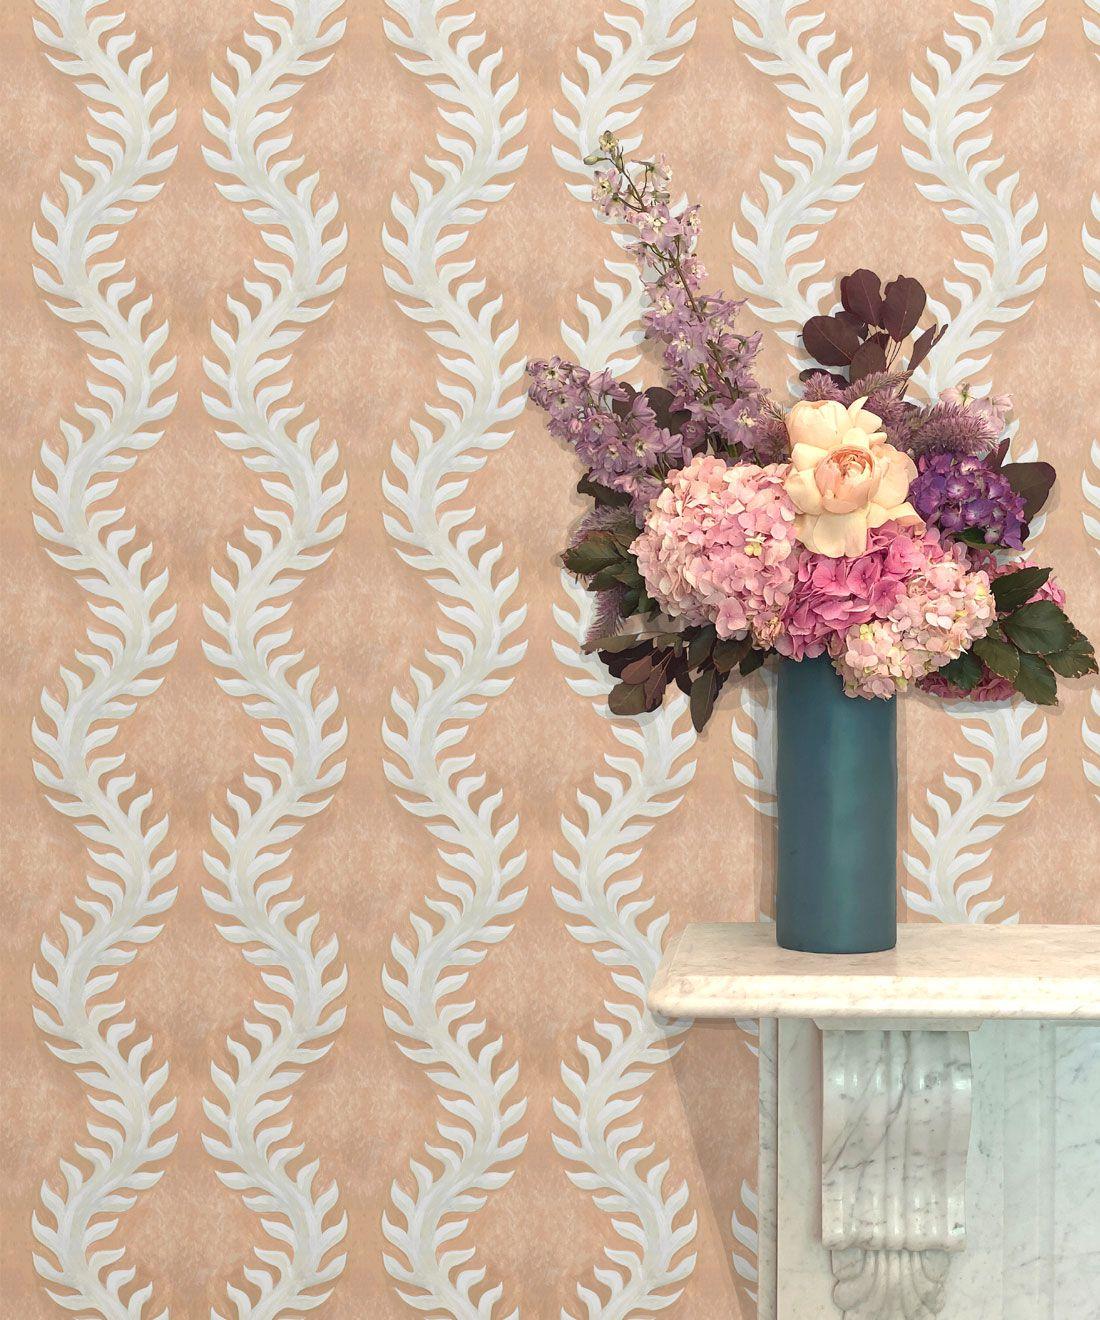 Fern Wallpaper • Salmon Wallpaper •Insitu